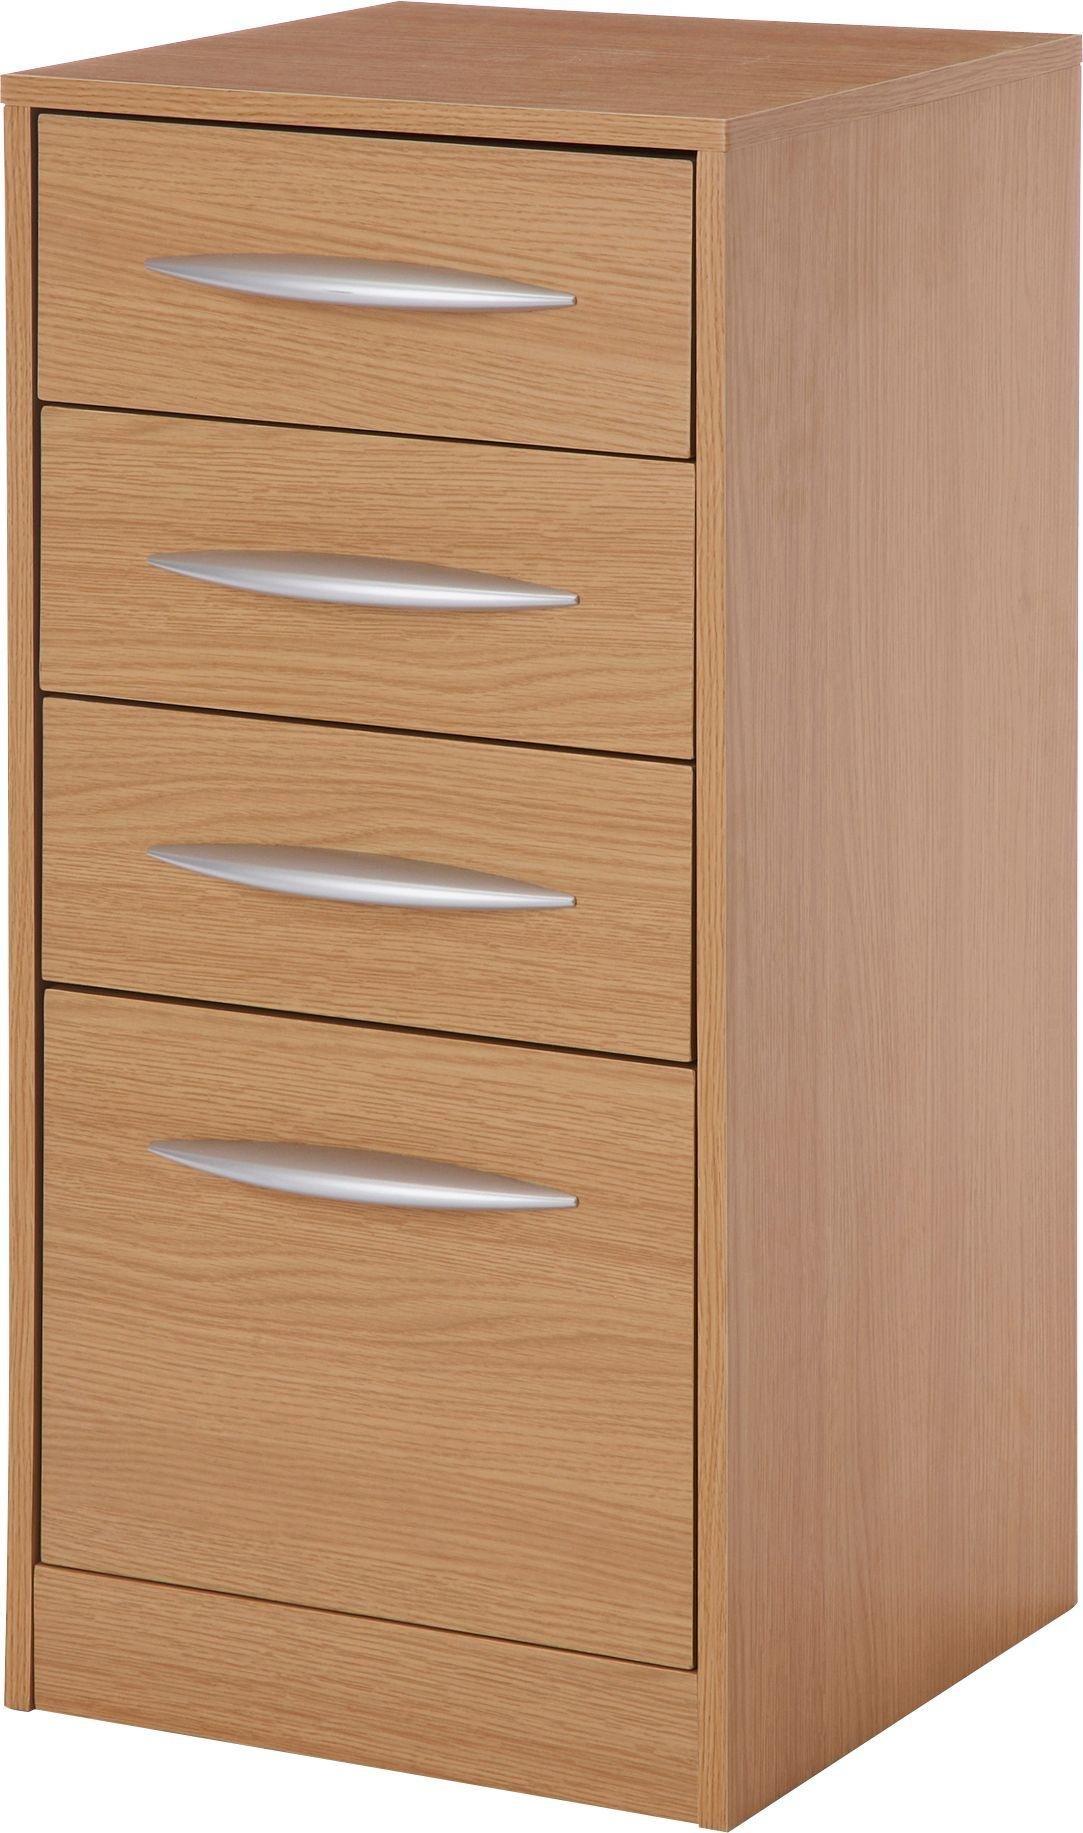 HOME 4 Drawer Filing Cabinet   Oak Effect